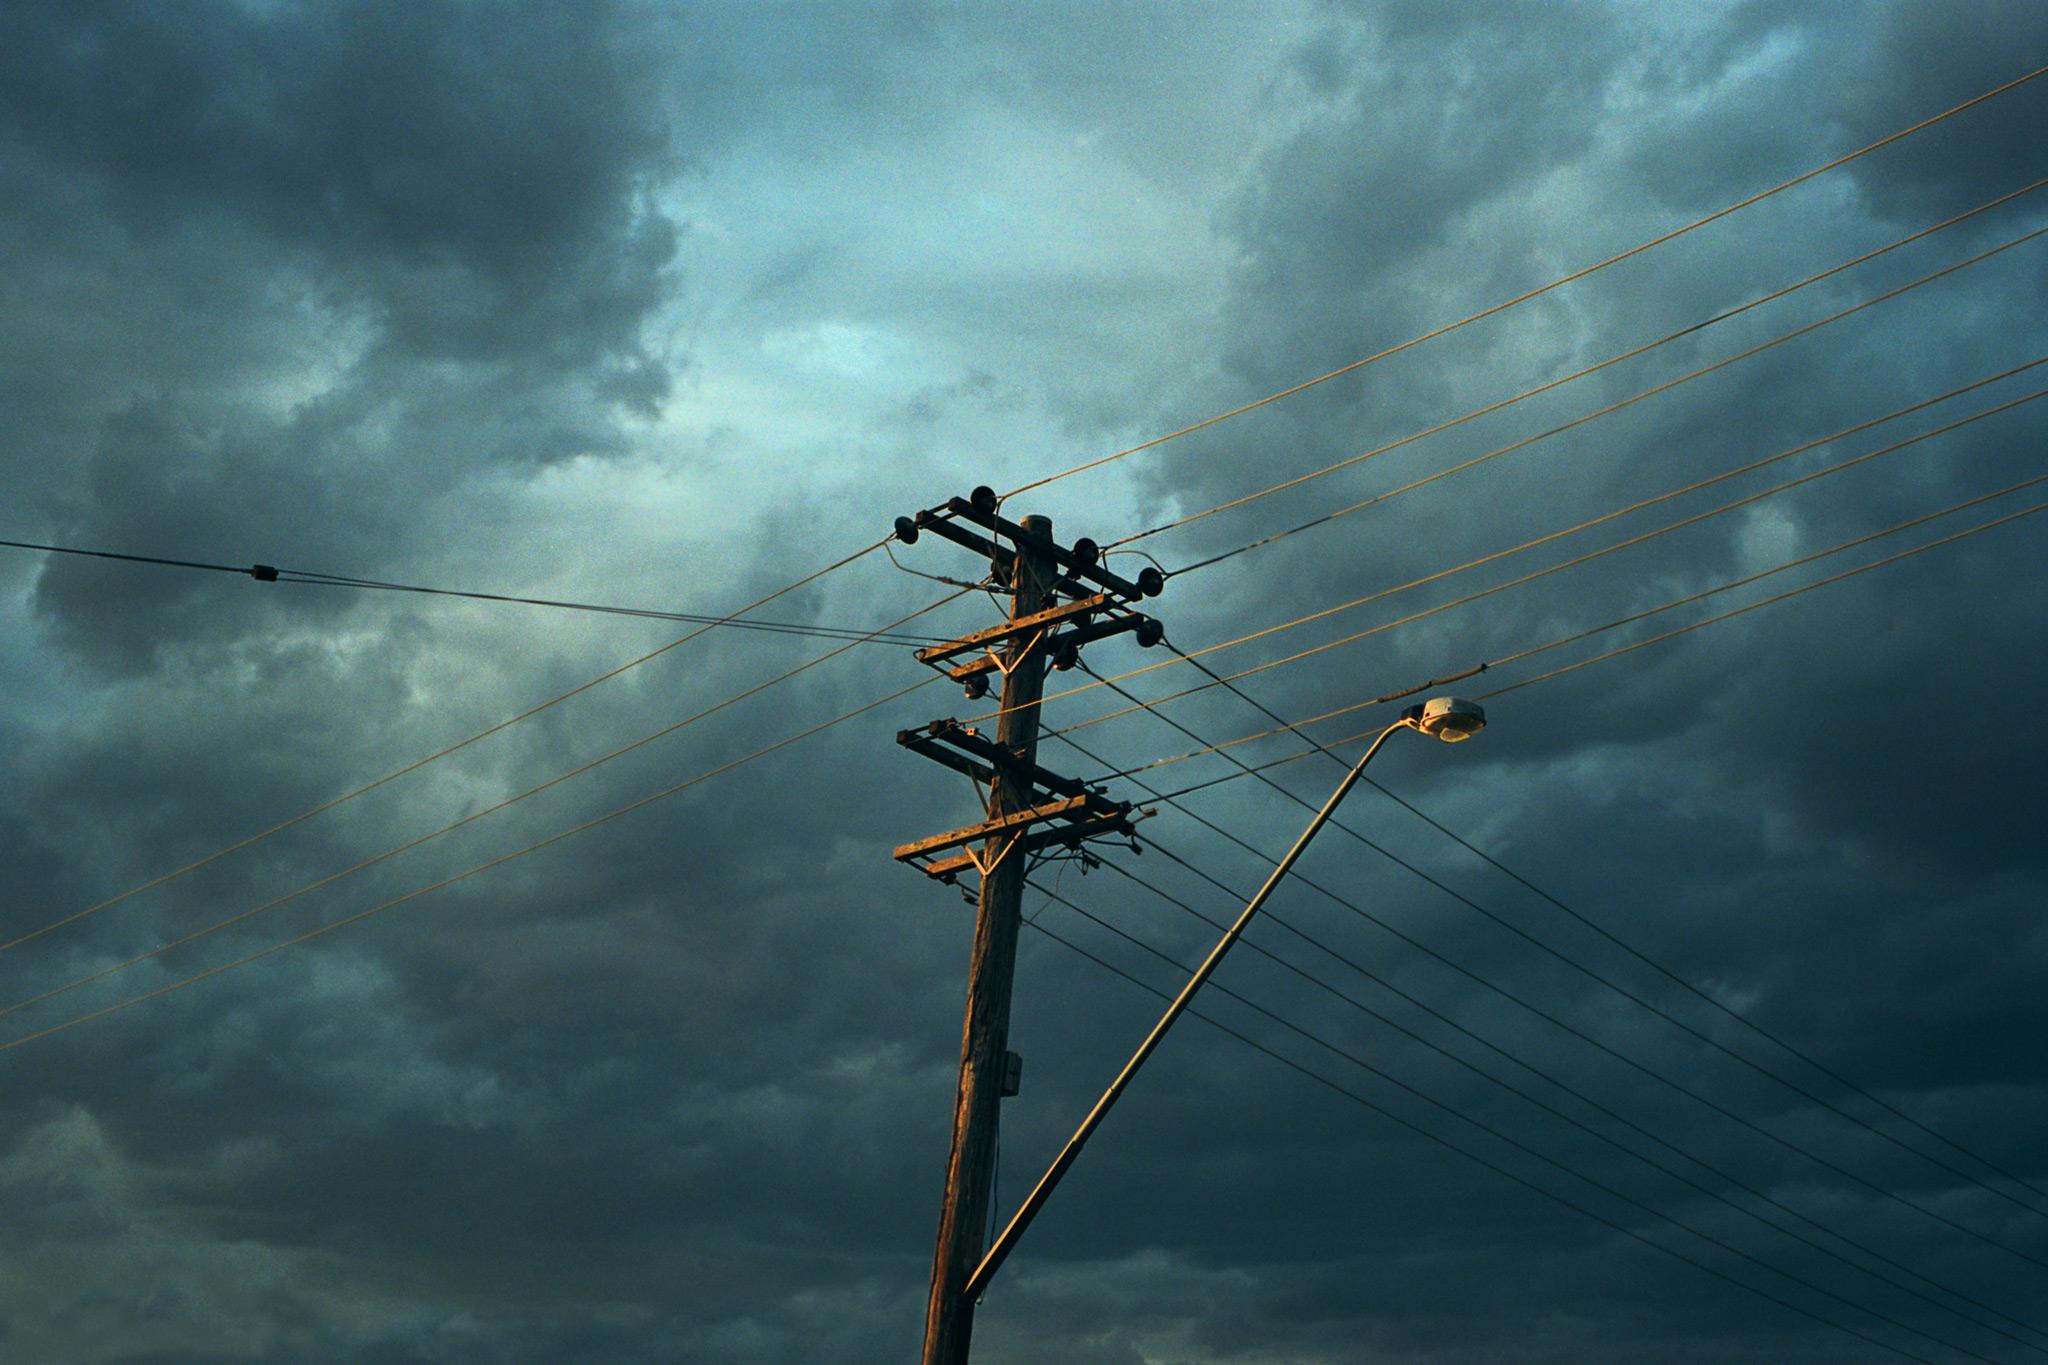 171113-Wires-Centre-web.jpg